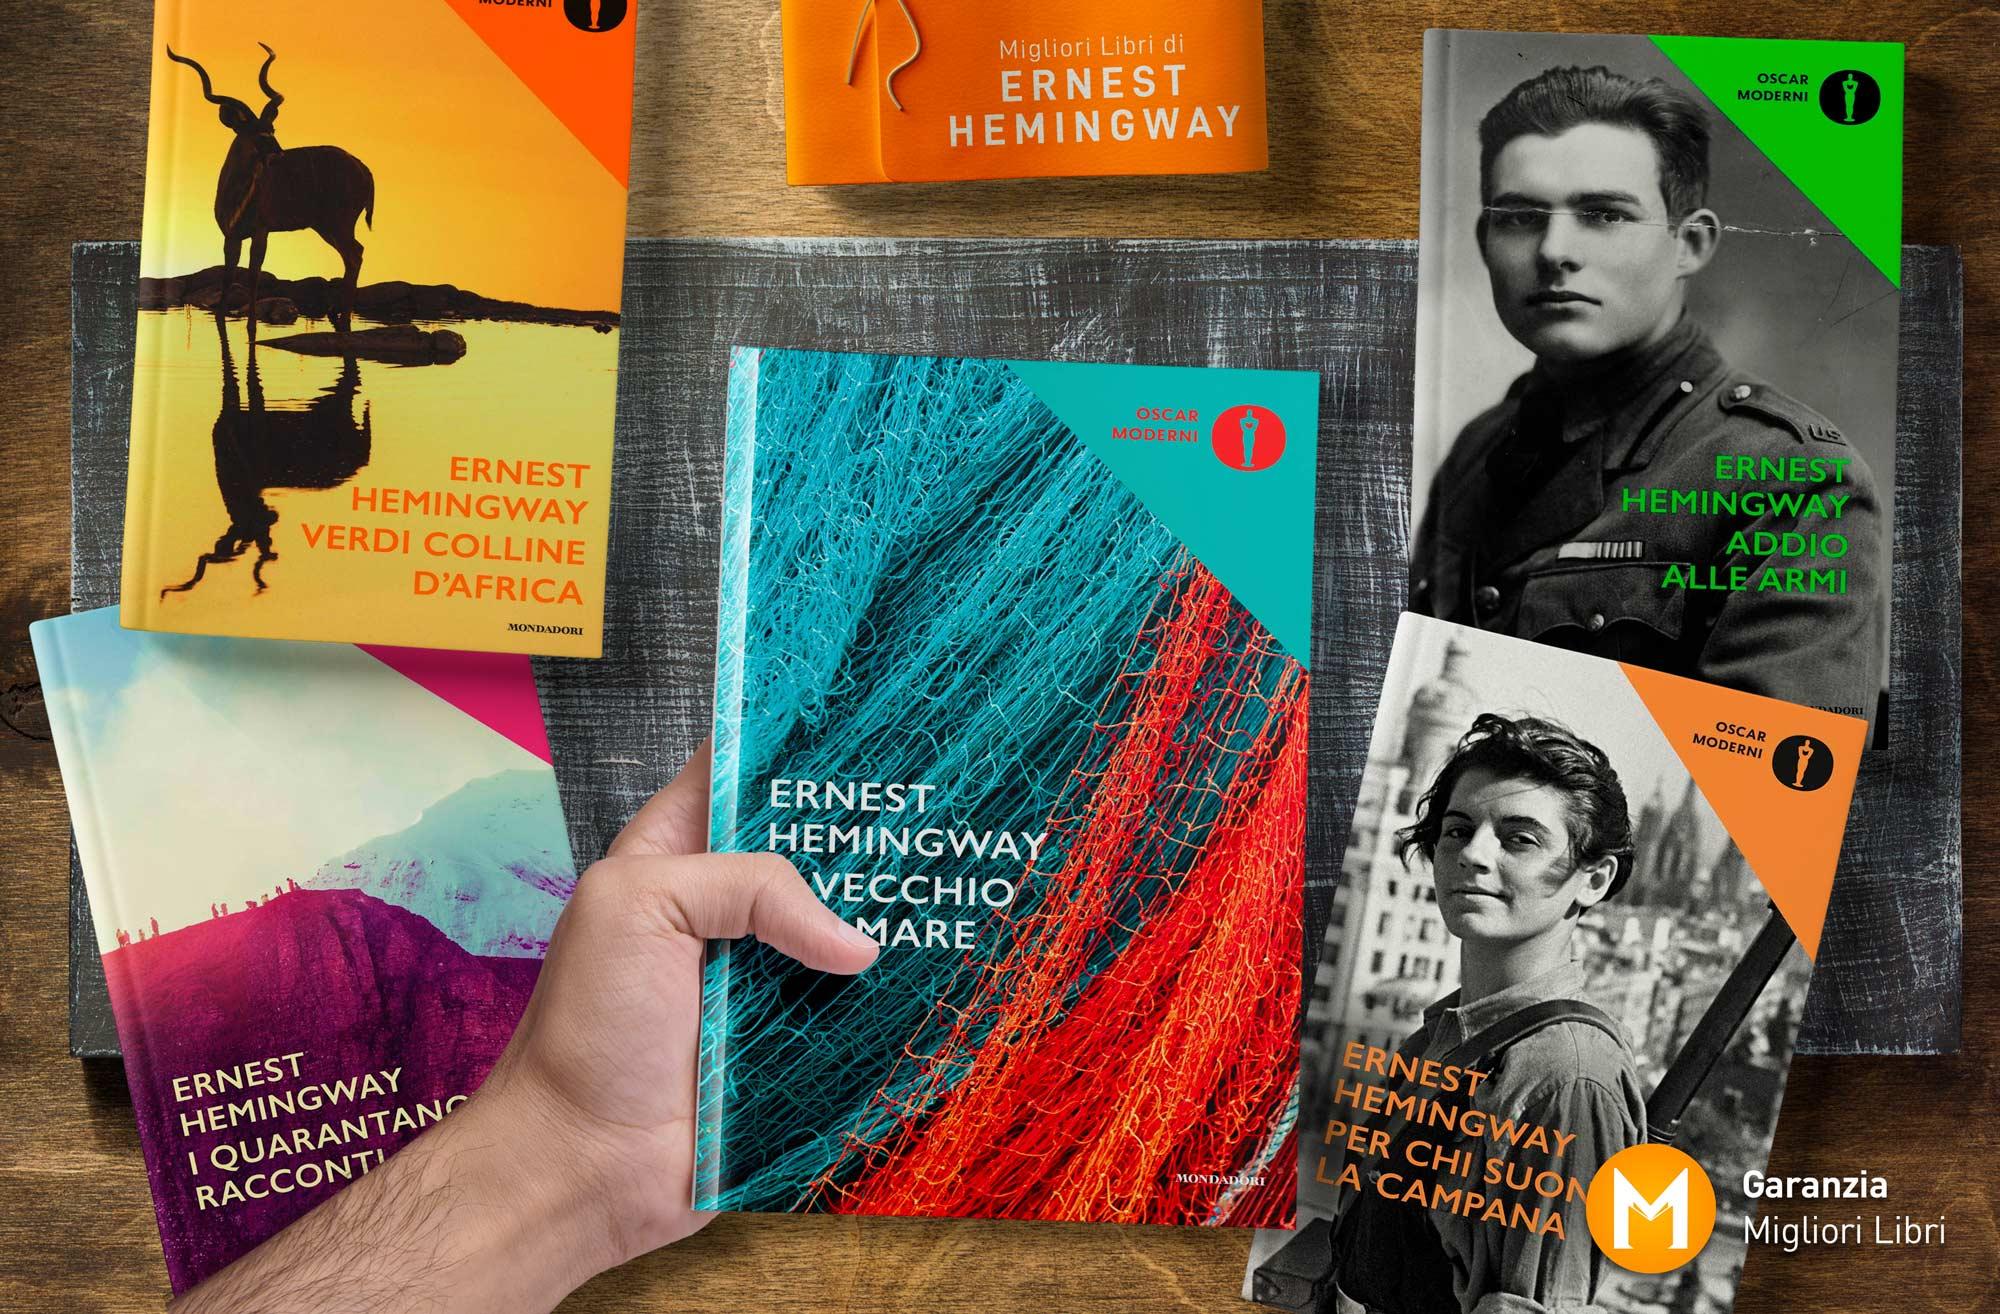 migliori-libri-hernest-hemingway